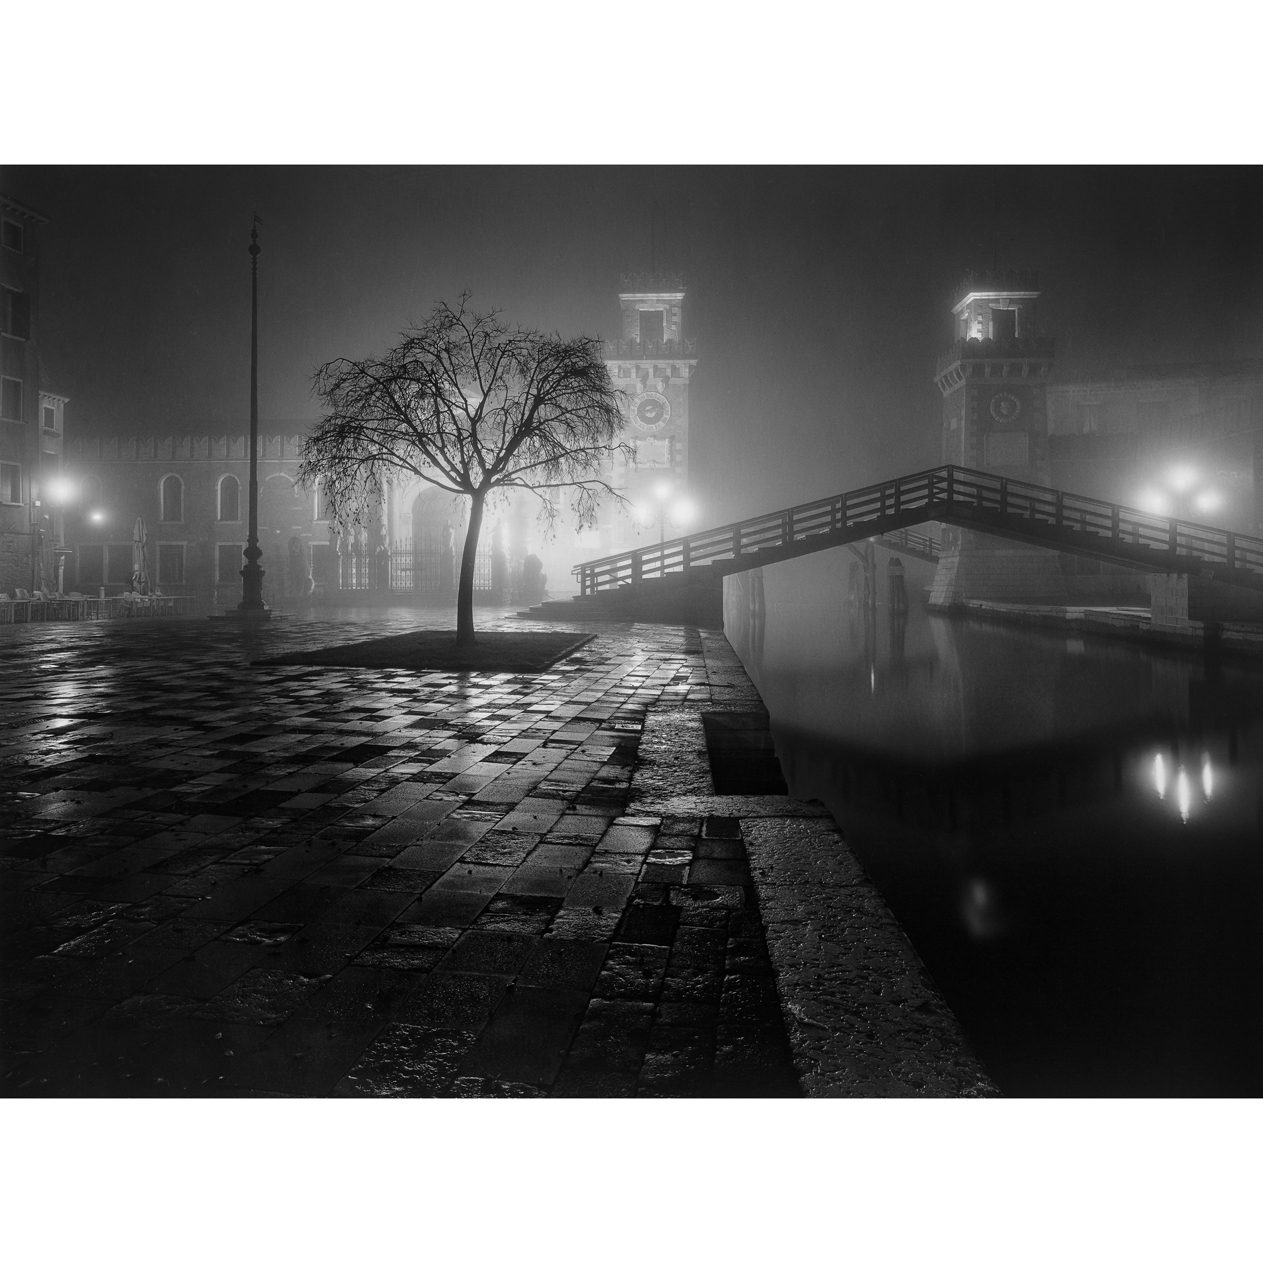 028 2015 Arca Swiss 4x5 Venice Italy MGFB Classic 1K by Max Bedov